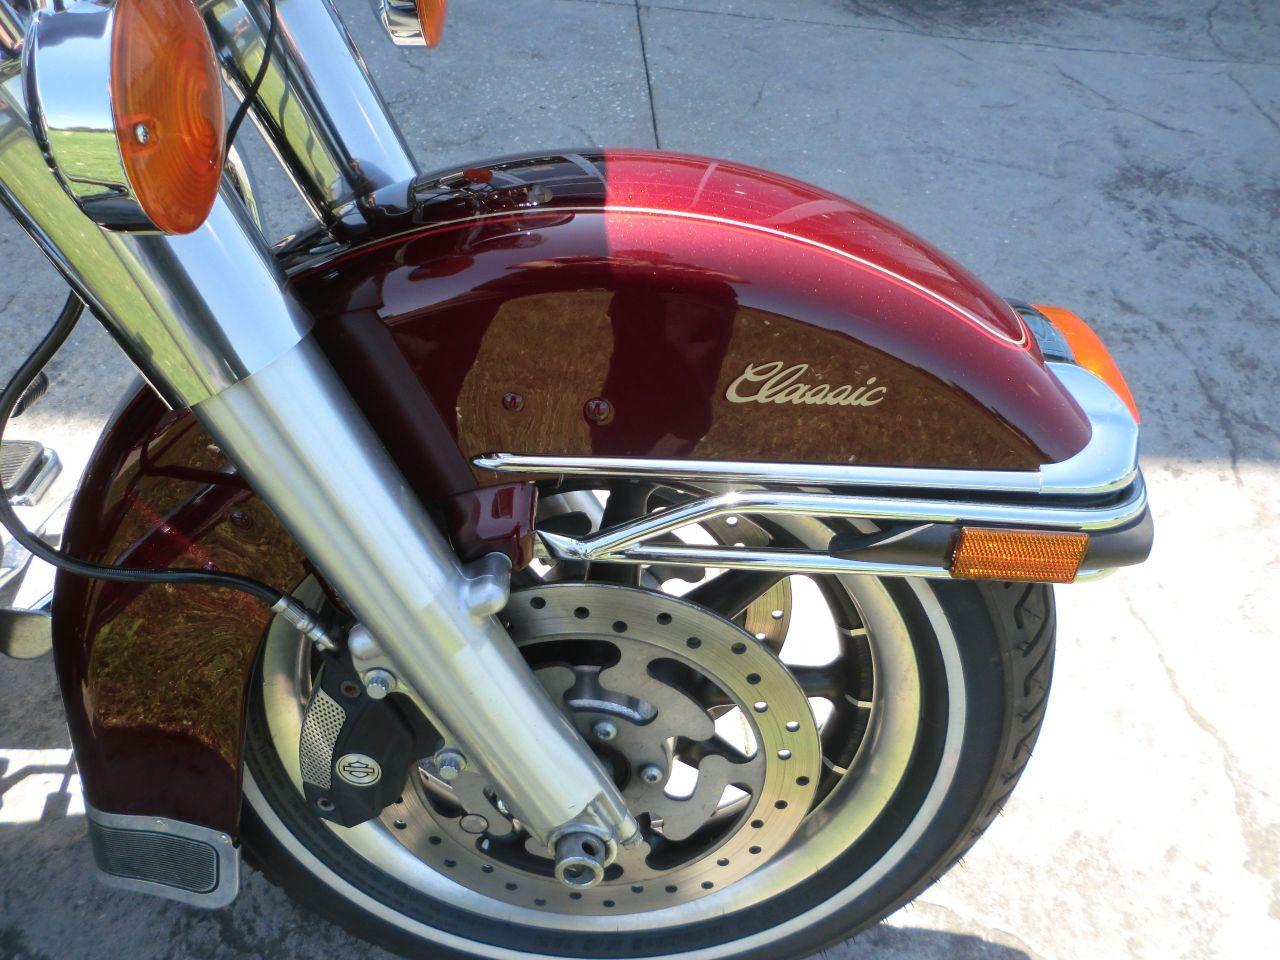 2008 Harley-Davidson Electra Glide